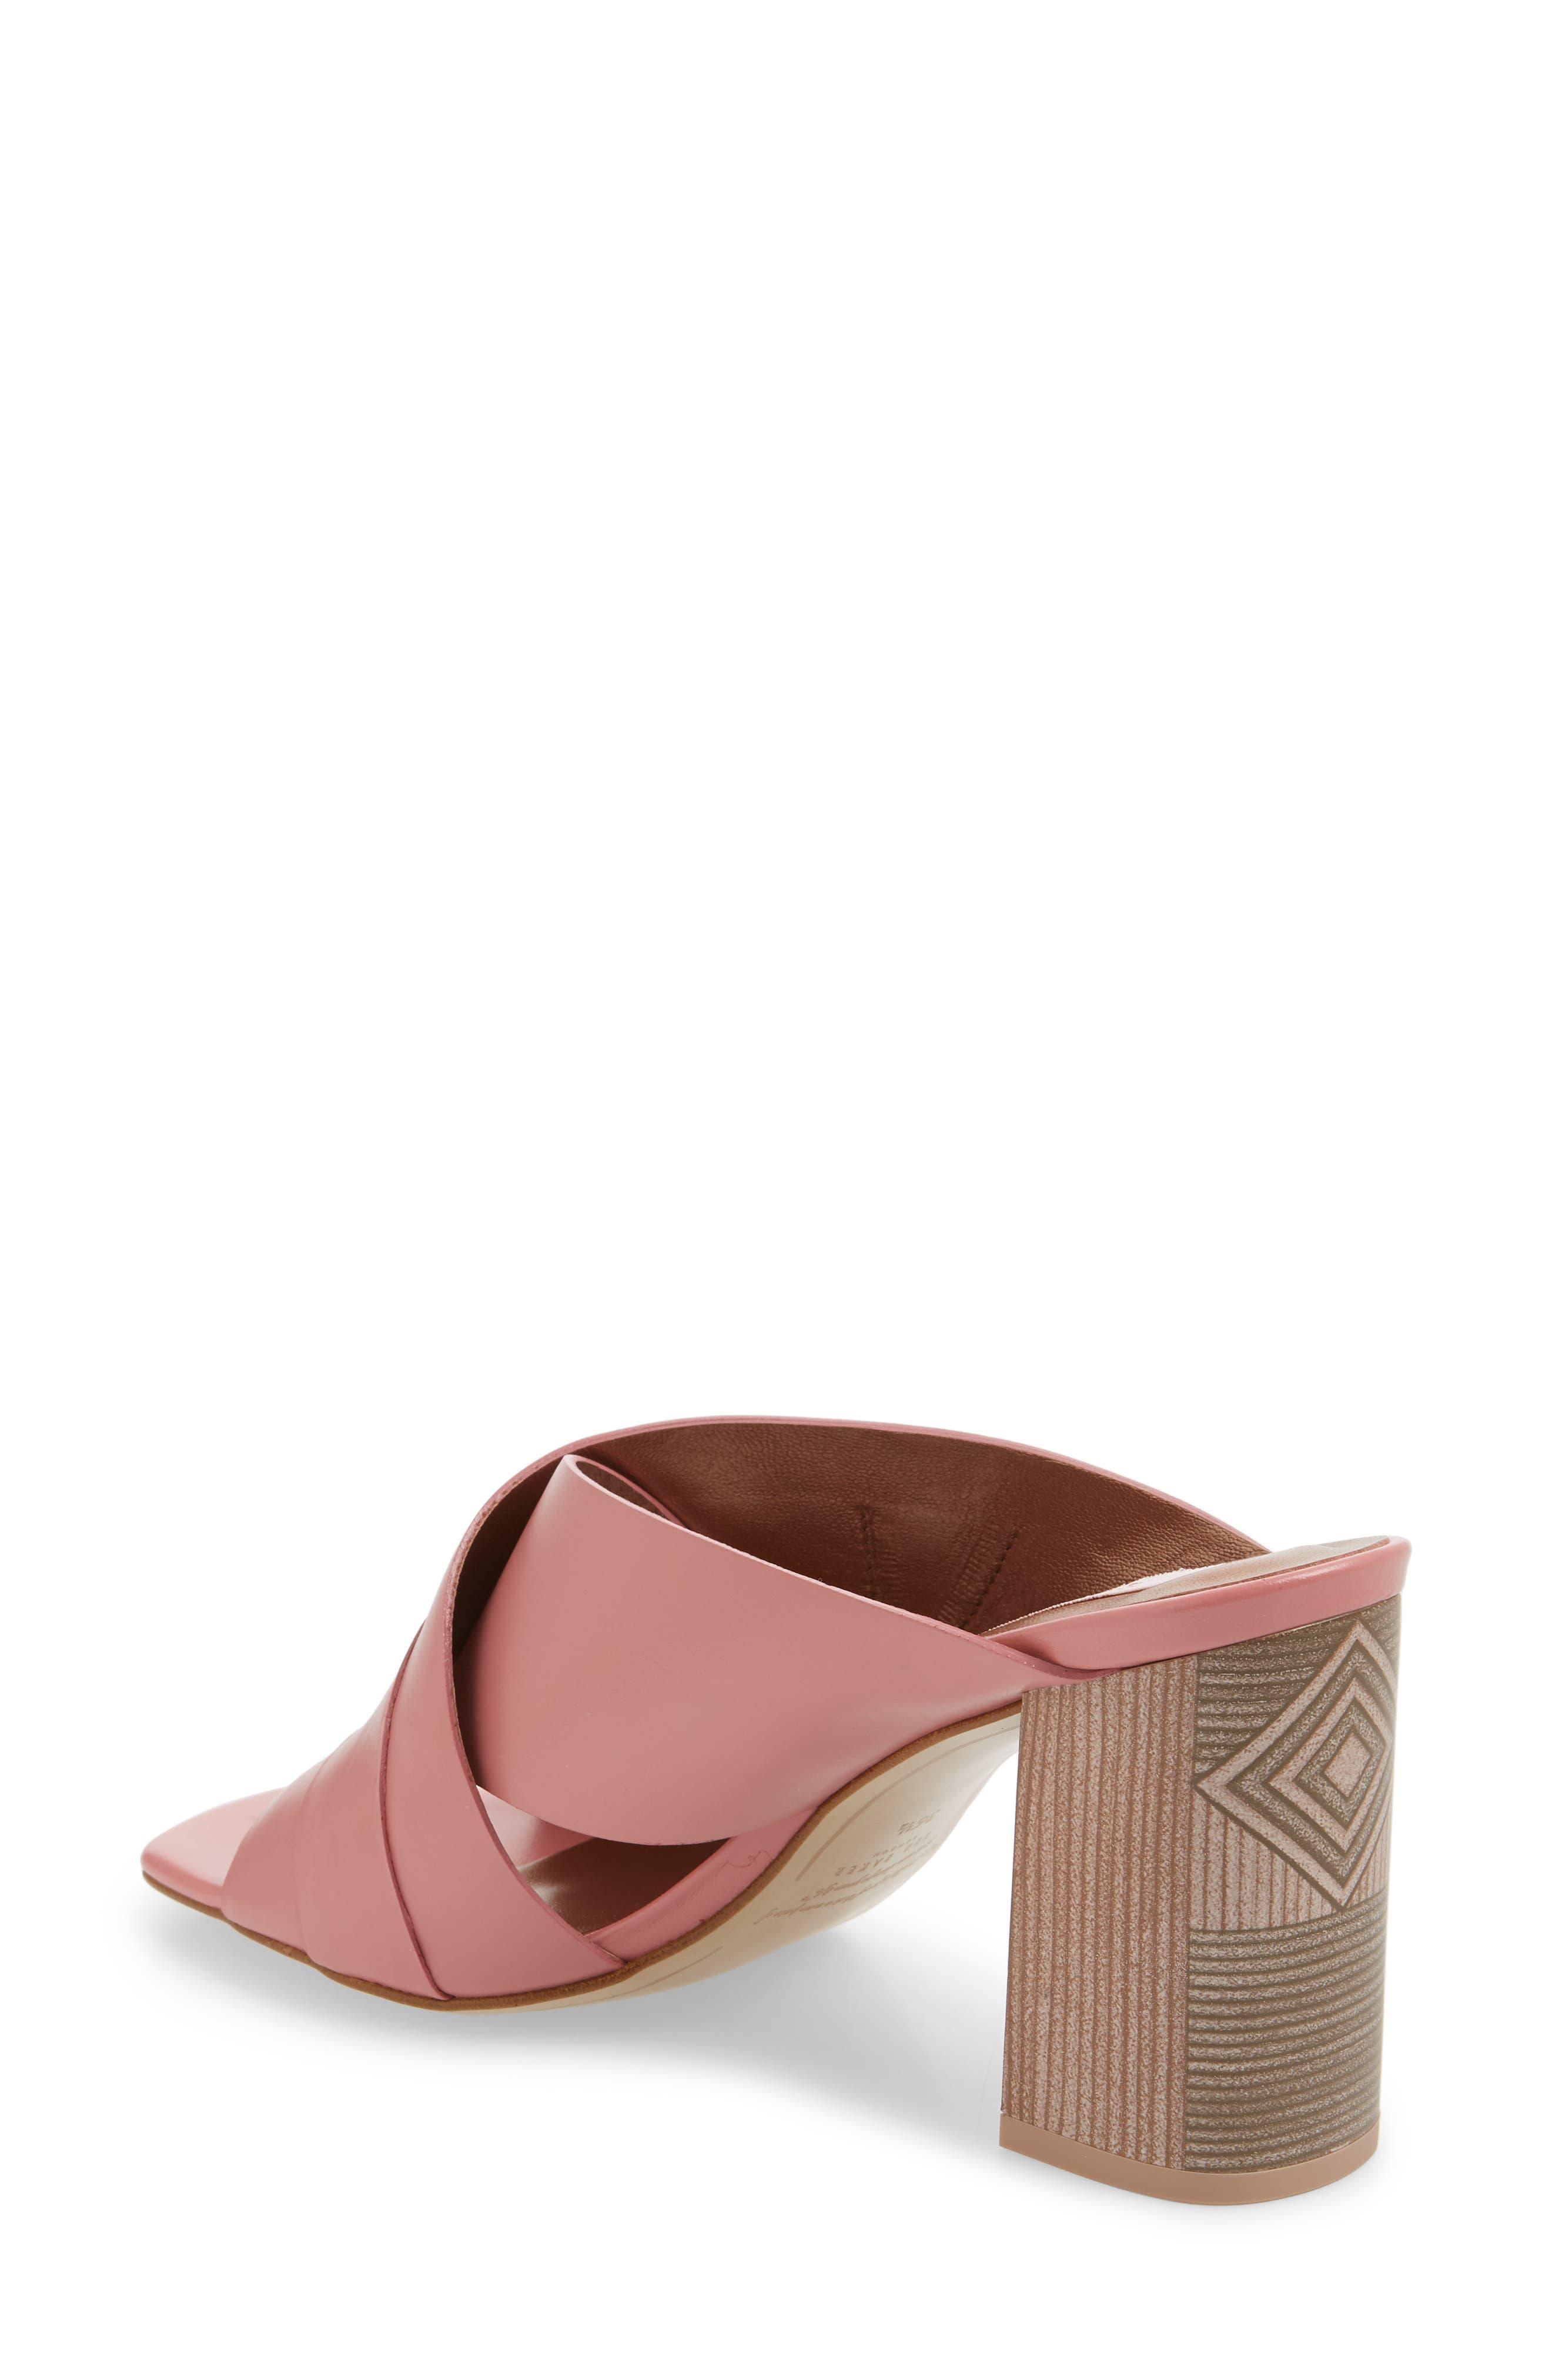 Malada Slide Sandal,                             Alternate thumbnail 2, color,                             Pink Leather